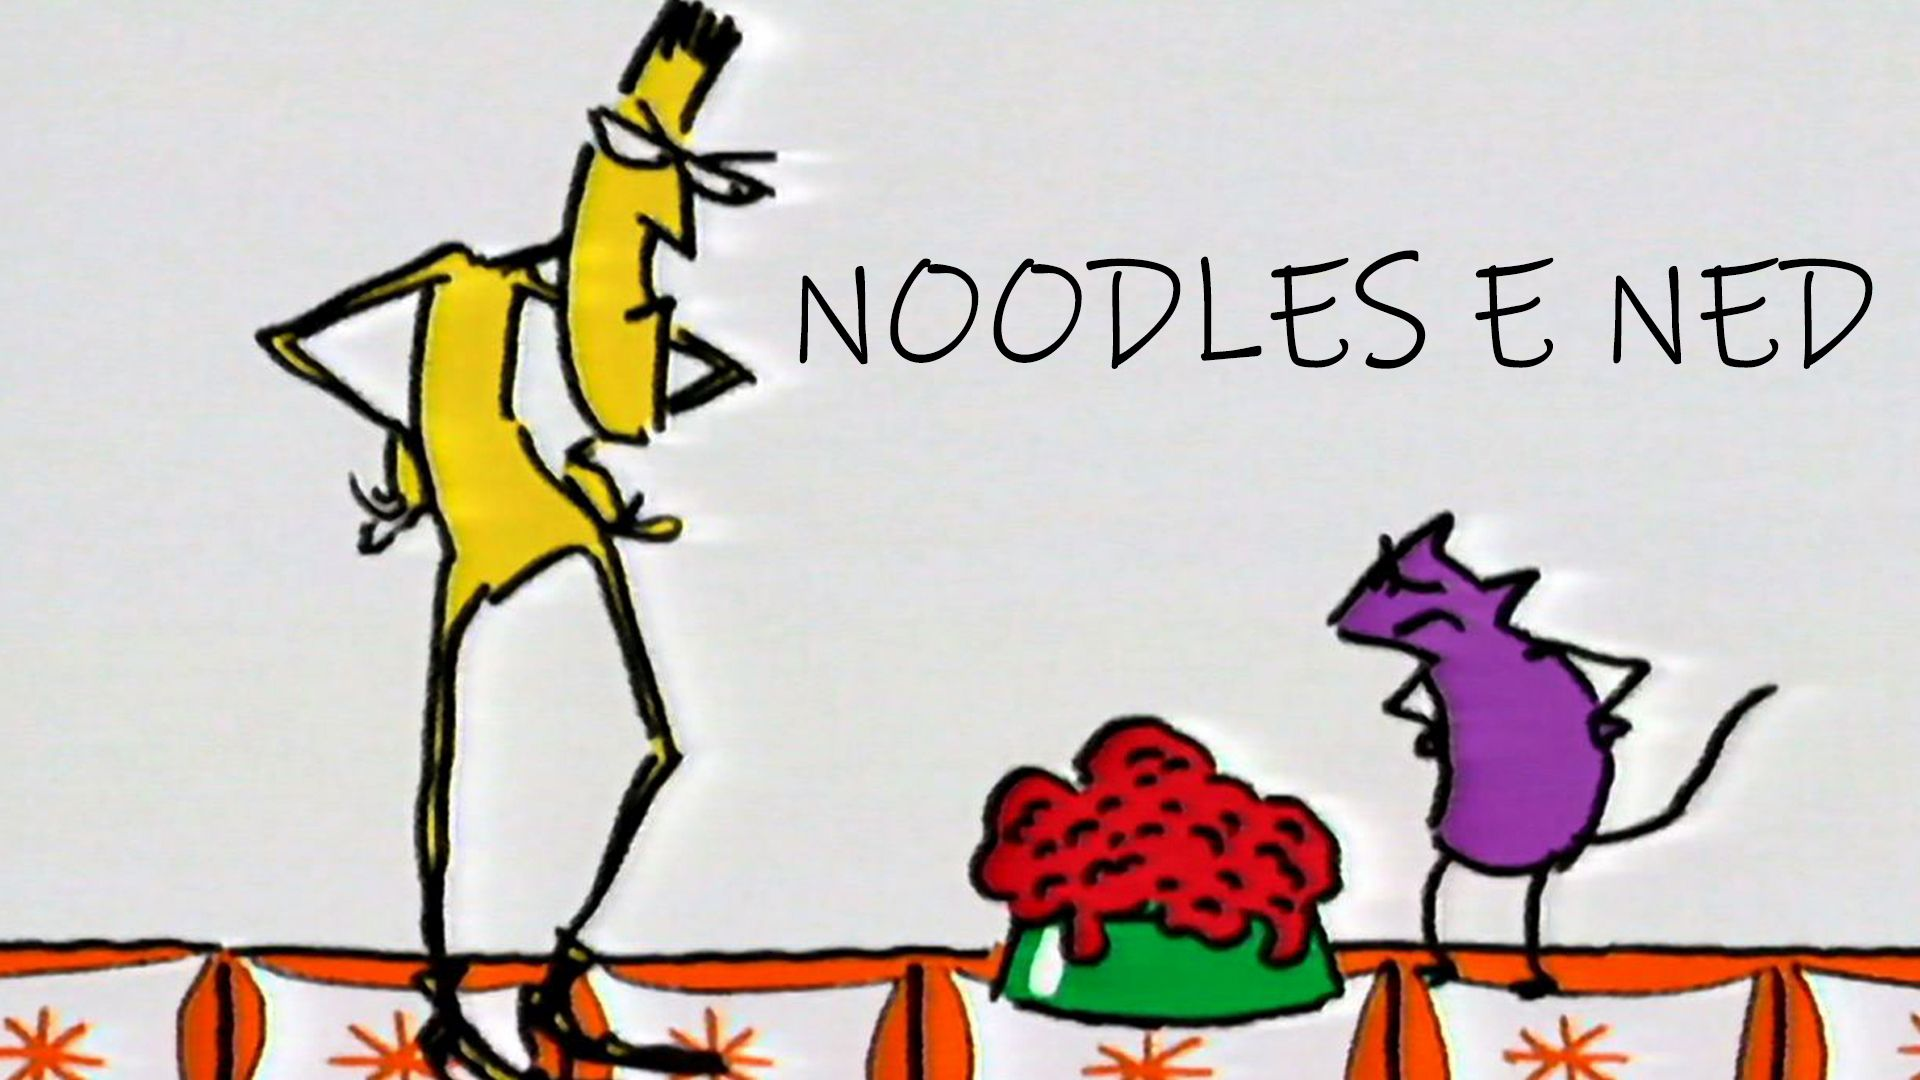 Noodles e Ned